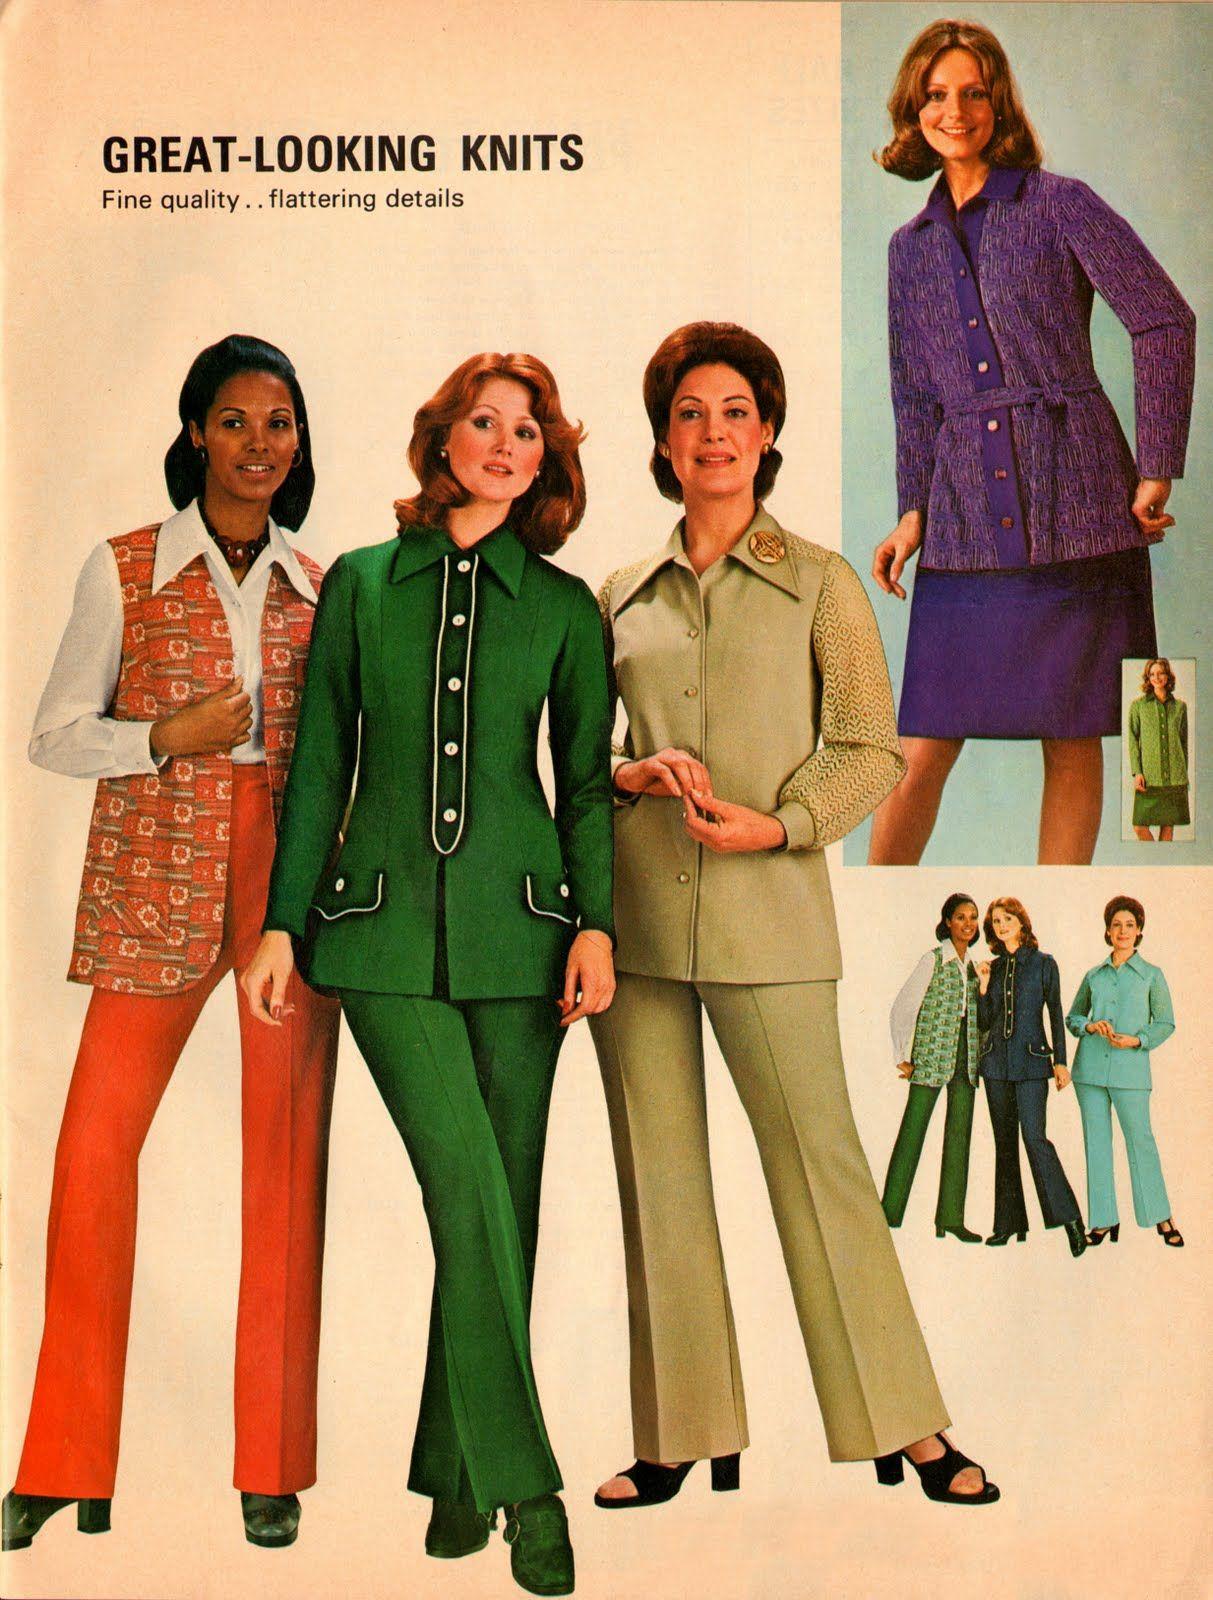 2ed19ee0bd2840346b82a05f5525f69c seventies fashion google zoeken 70s fashion pinterest,Womens Clothing 70s